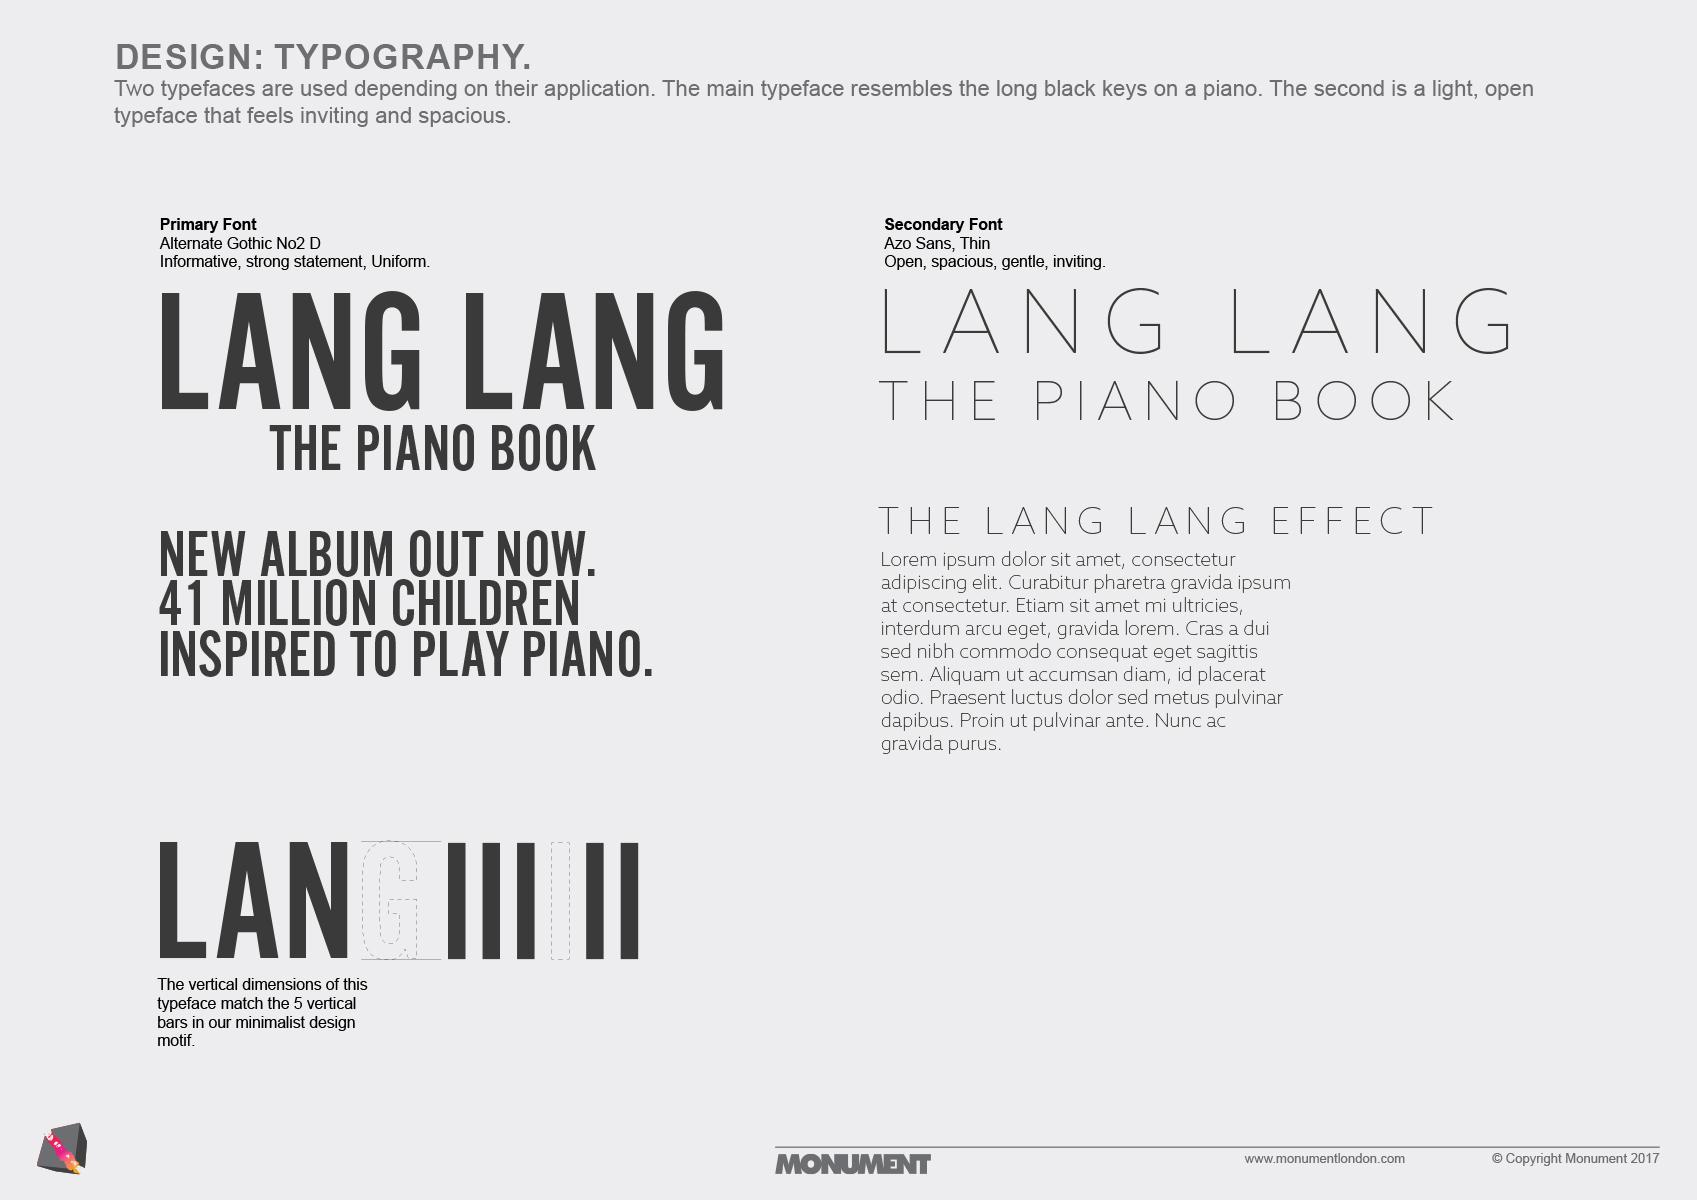 LangLang_ThePianoBook-Treatment_Monument_28.03.17_V3-17.jpg